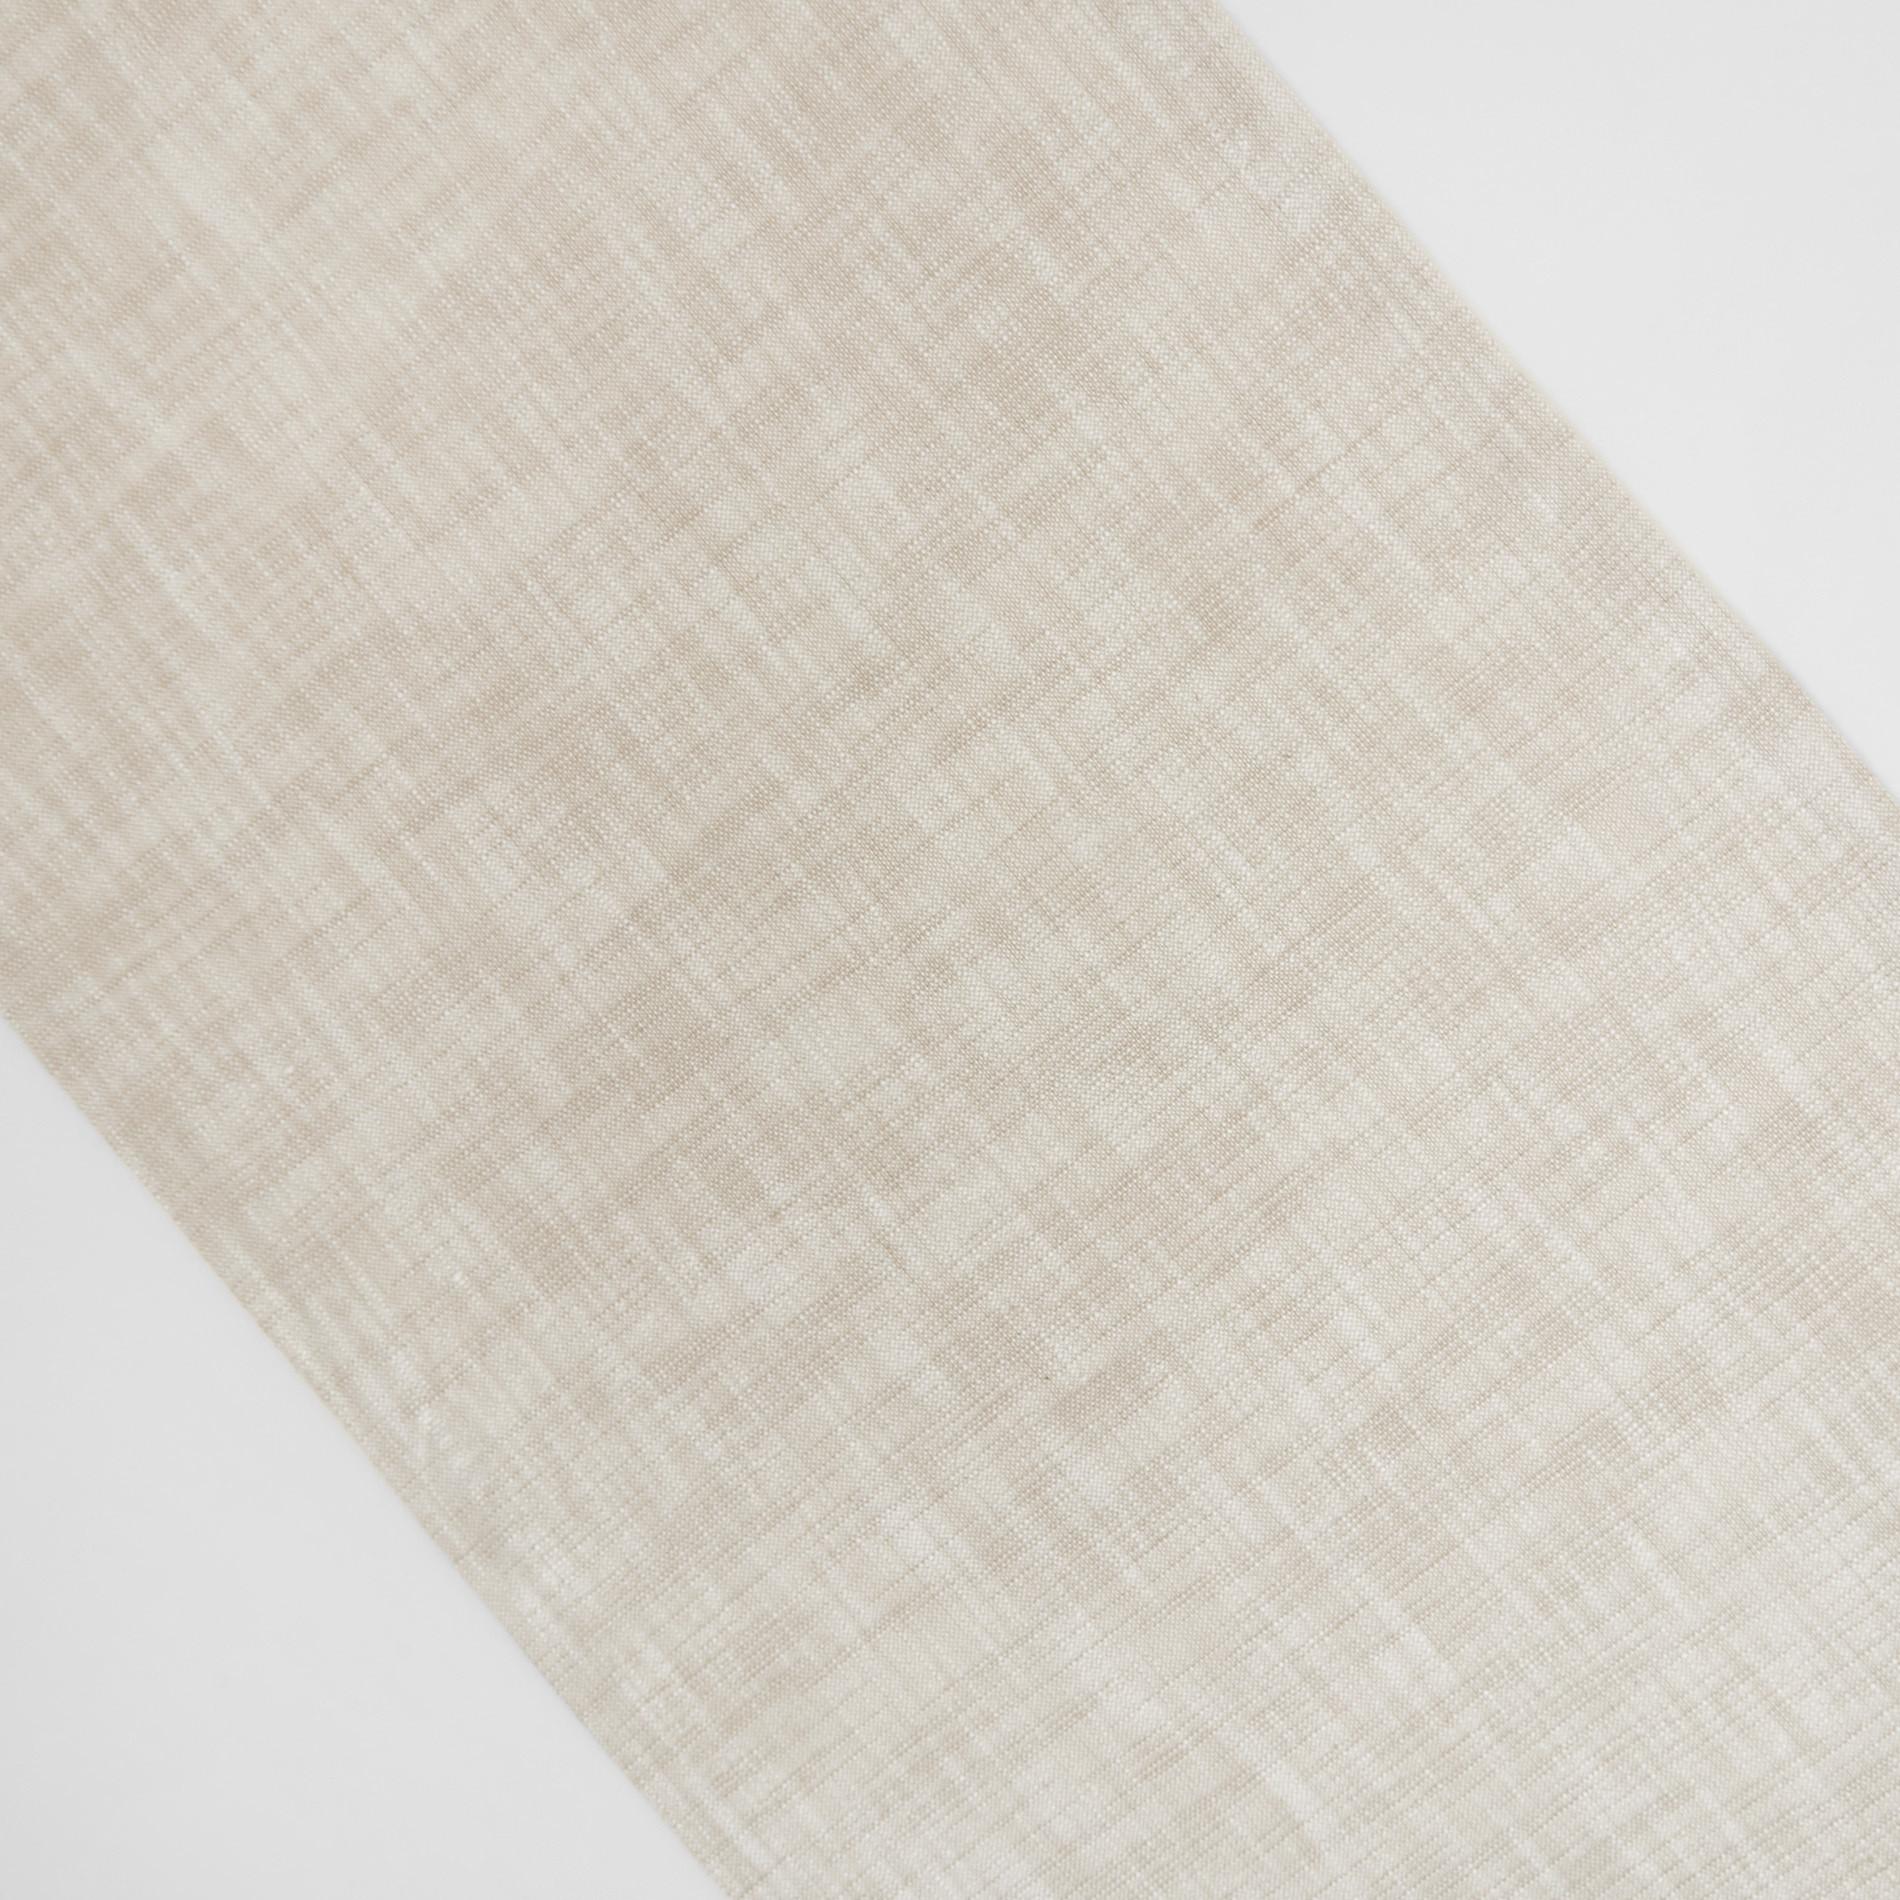 Runner puro cotone fiammato tinta unita, Beige chiaro, large image number 1